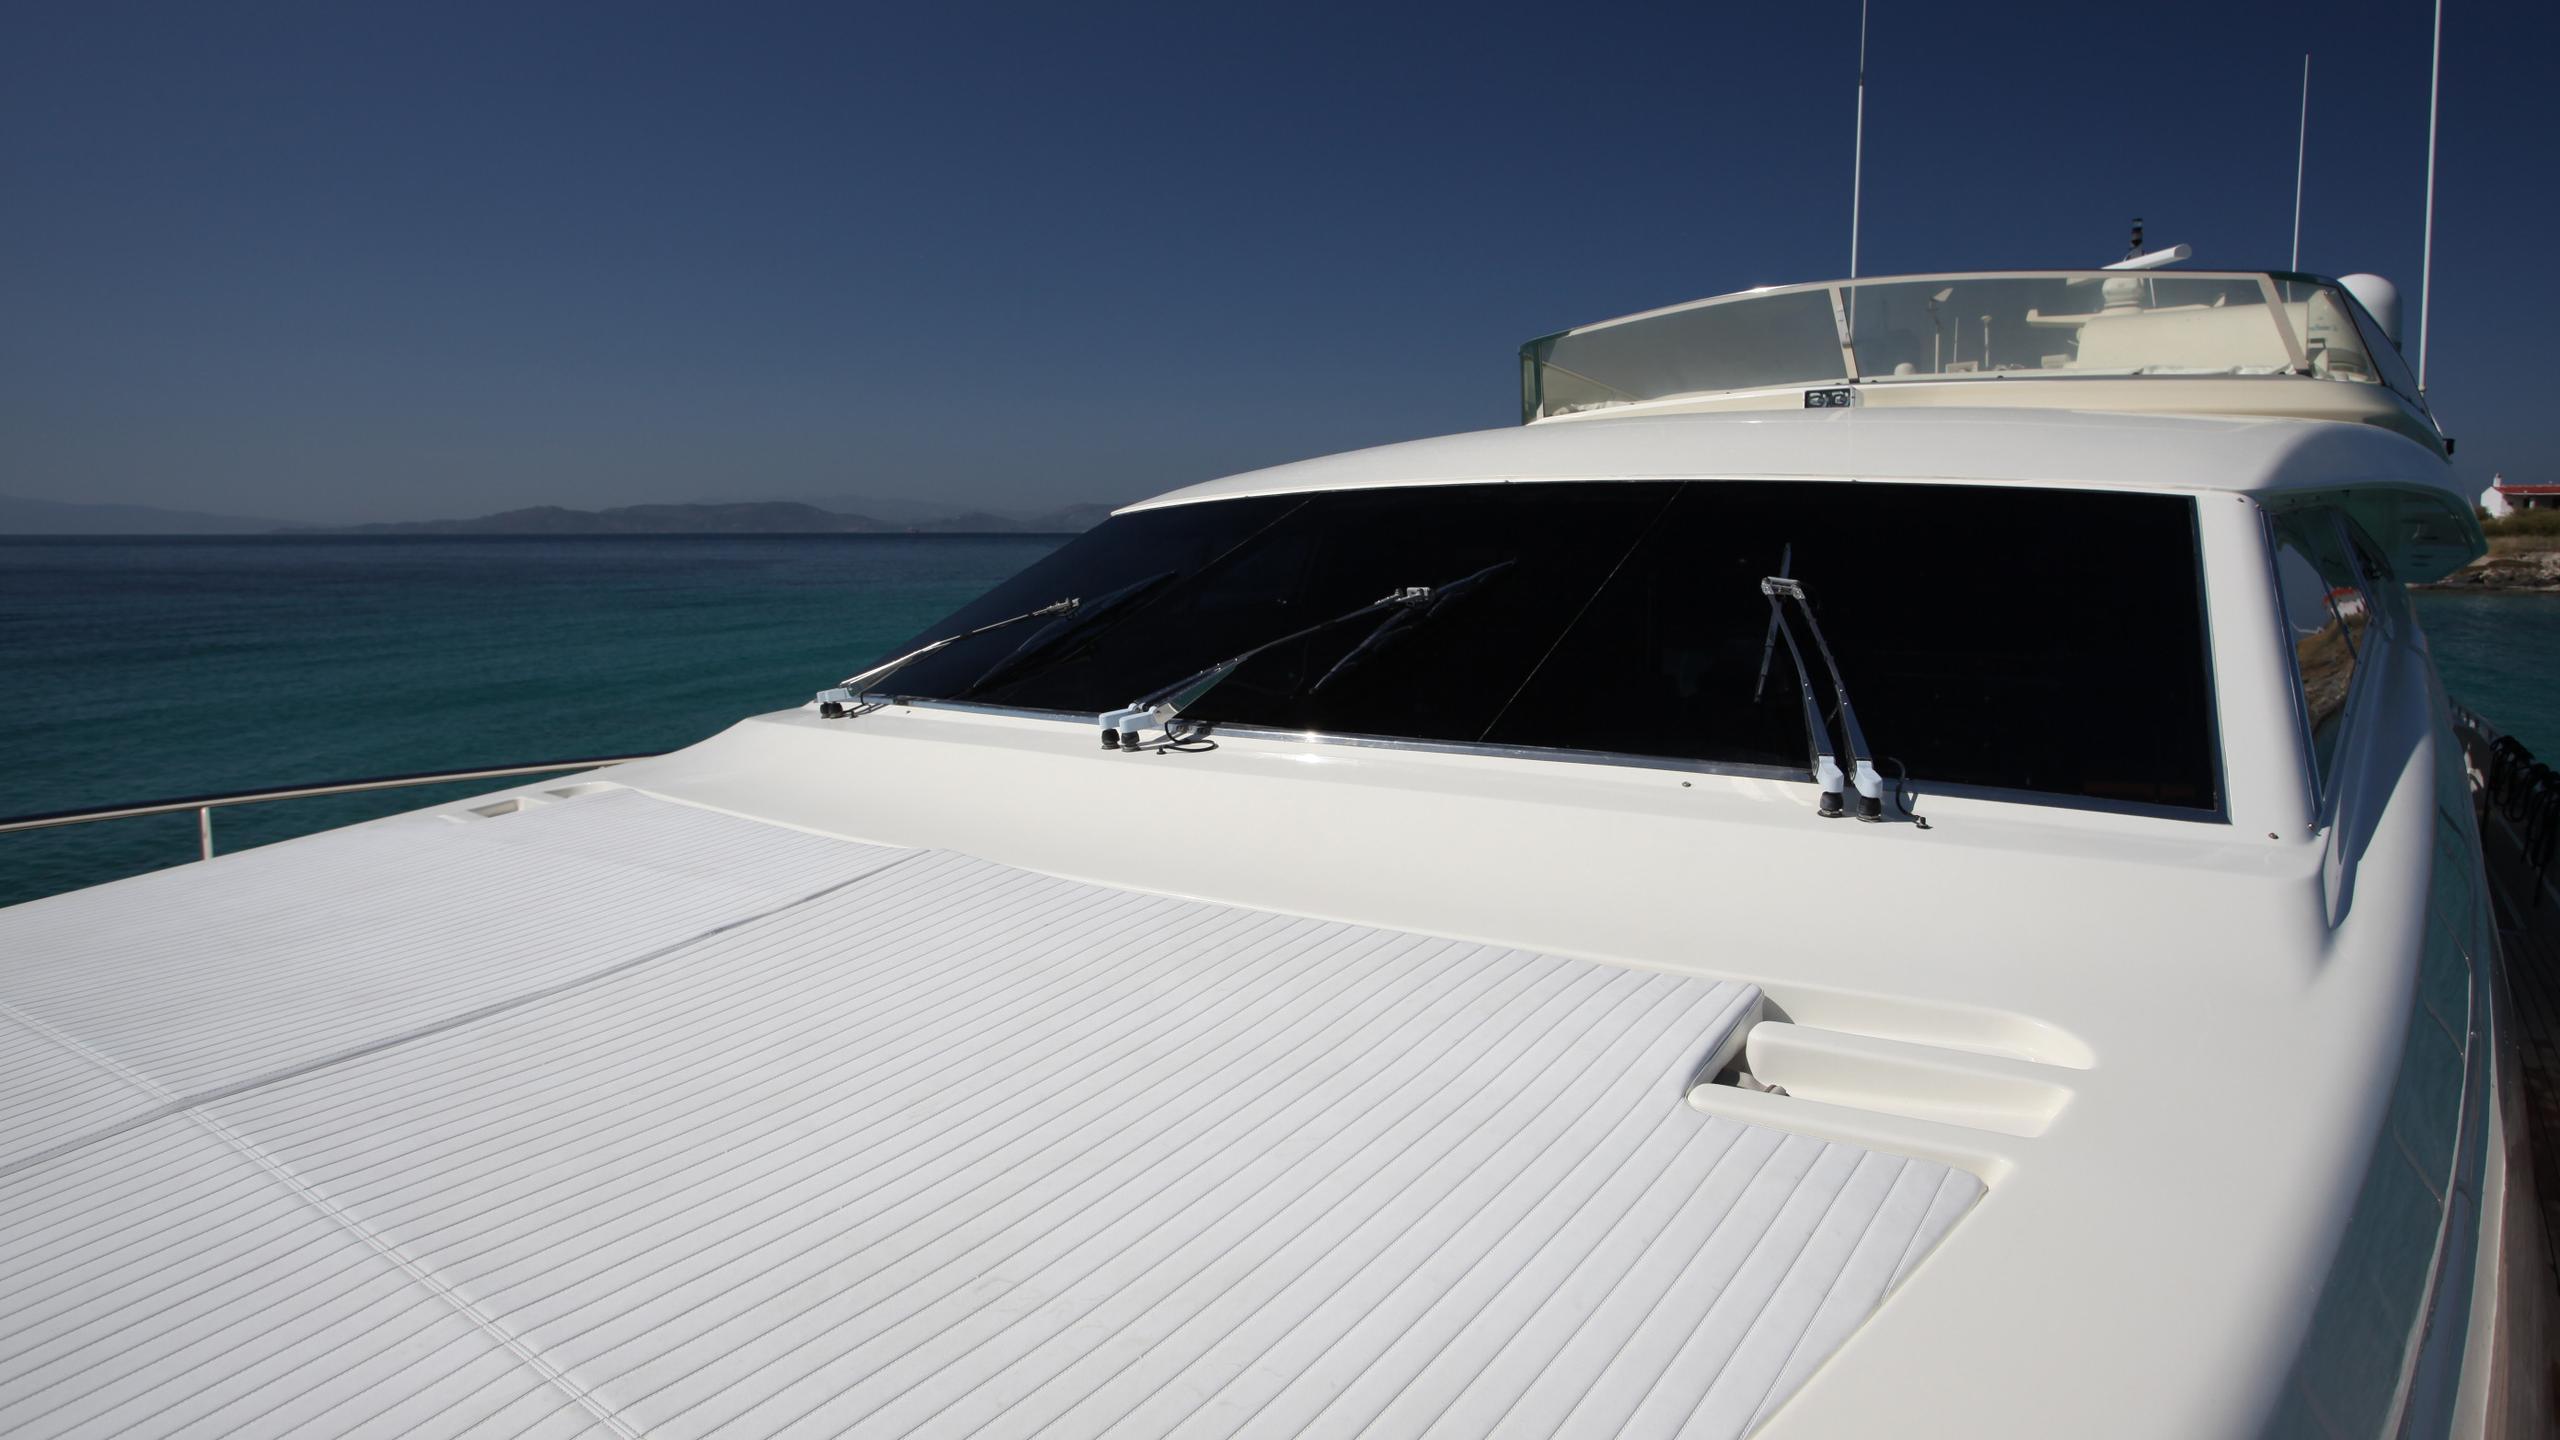 kentavros-ii-yacht-sunpads